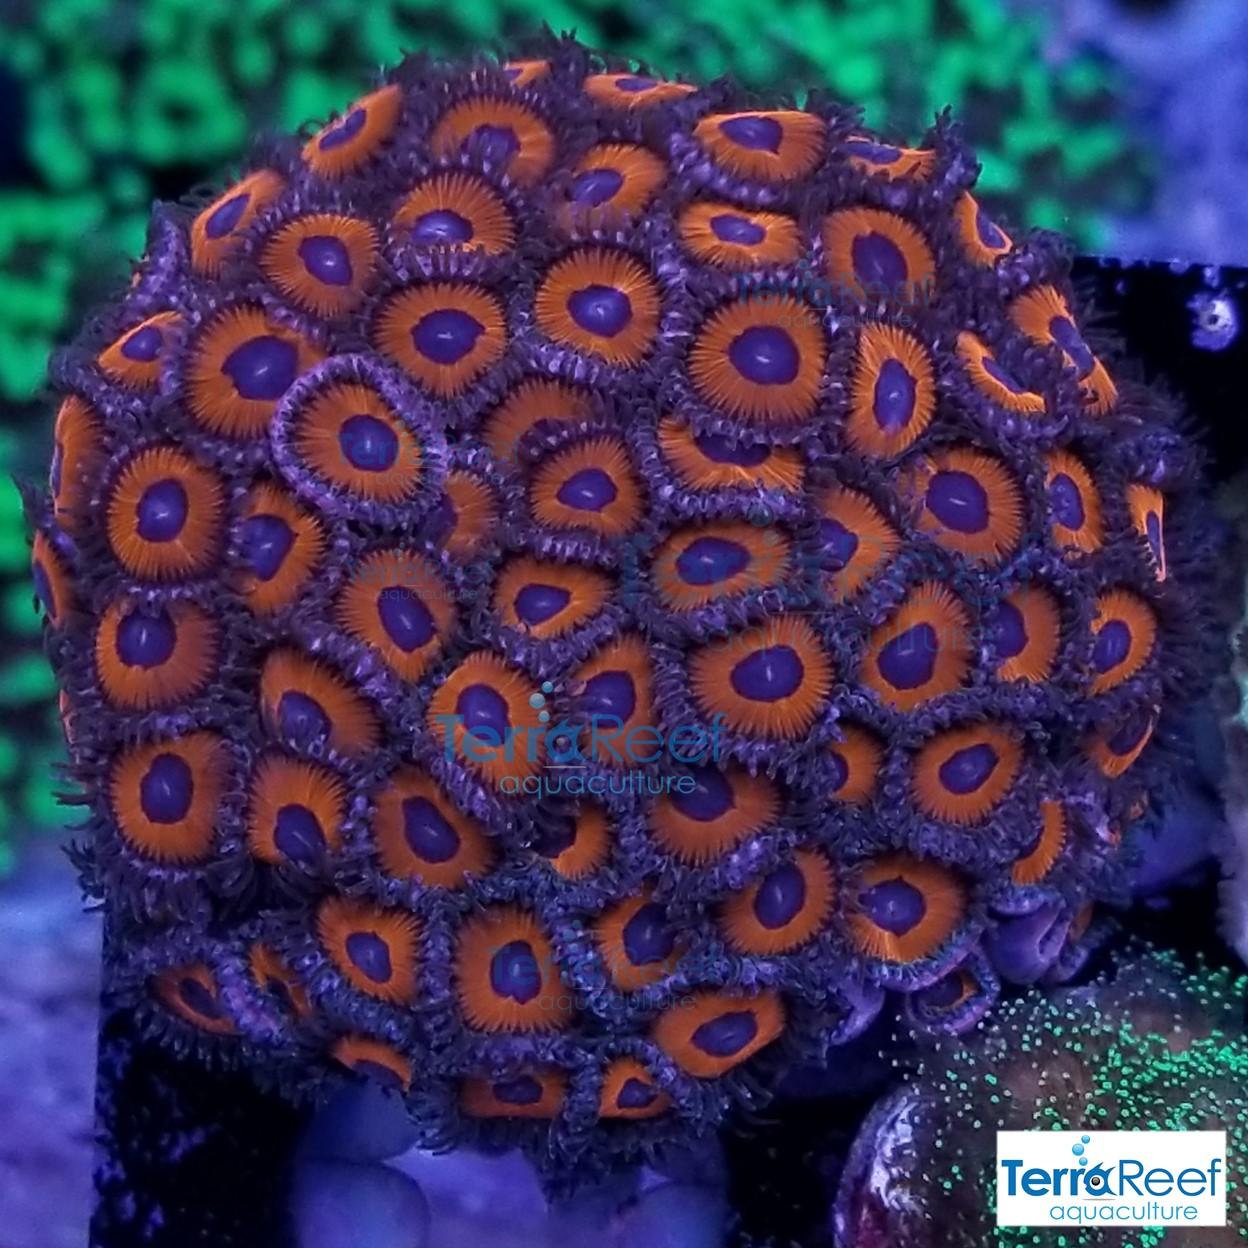 Red-Zoanthids-Coral-Polyps-WYSIWYG-Frag-2-20201228_211744.jpg